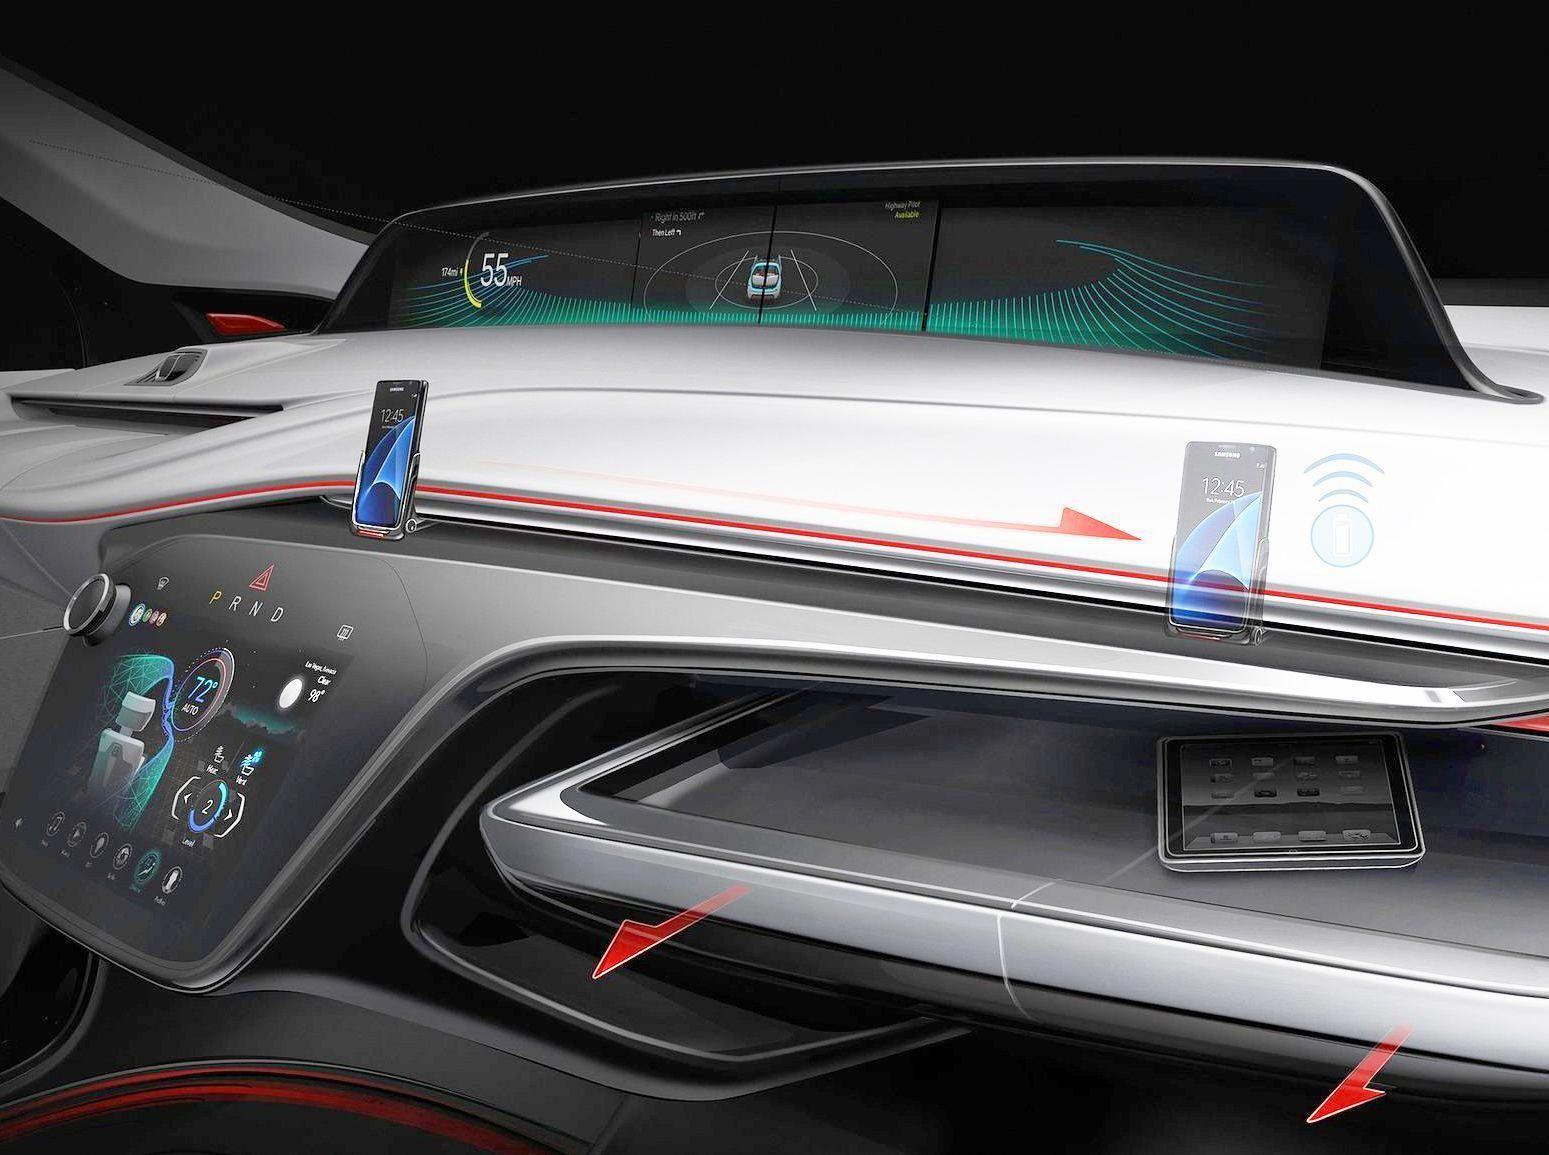 Interior Design Software Cheapinteriordesignideas Interiorplains Car Interior Design Sketch Concept Car Interior Interior Design Courses Online